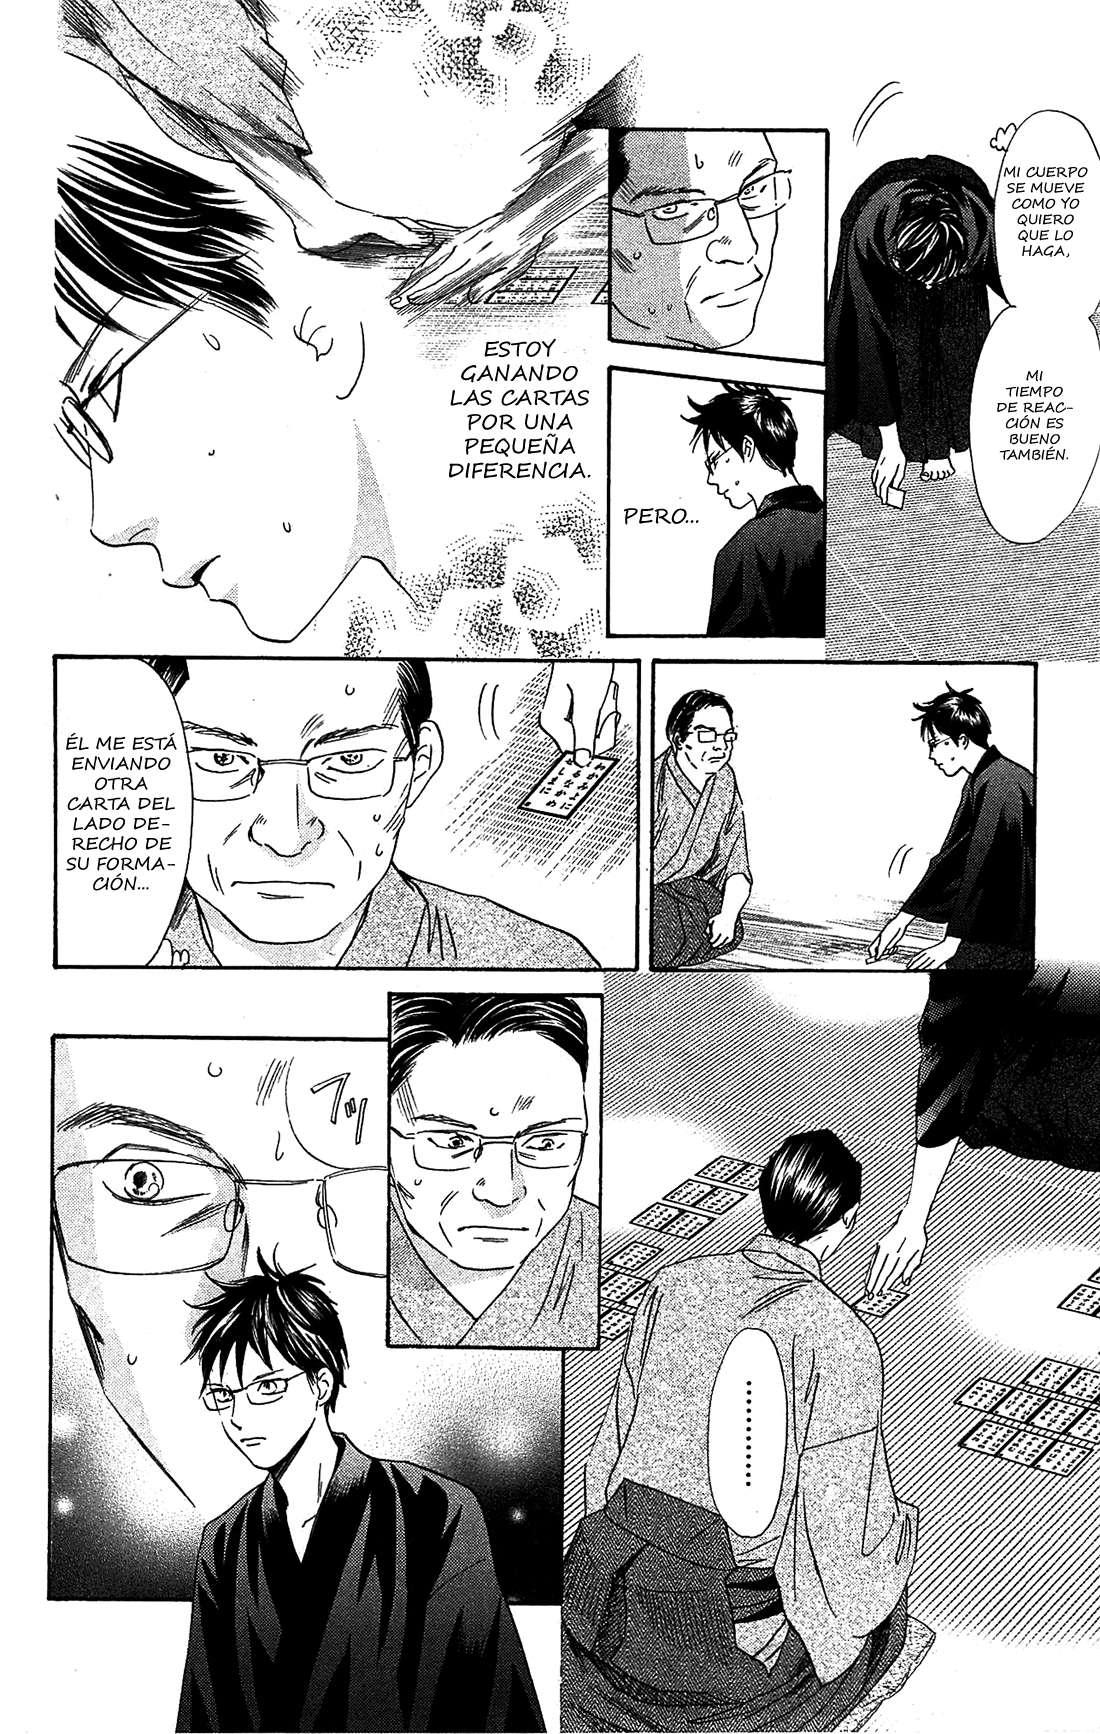 https://c5.ninemanga.com/es_manga/32/1824/398206/c51722d35b697aaf591f6066d68b57bd.jpg Page 15